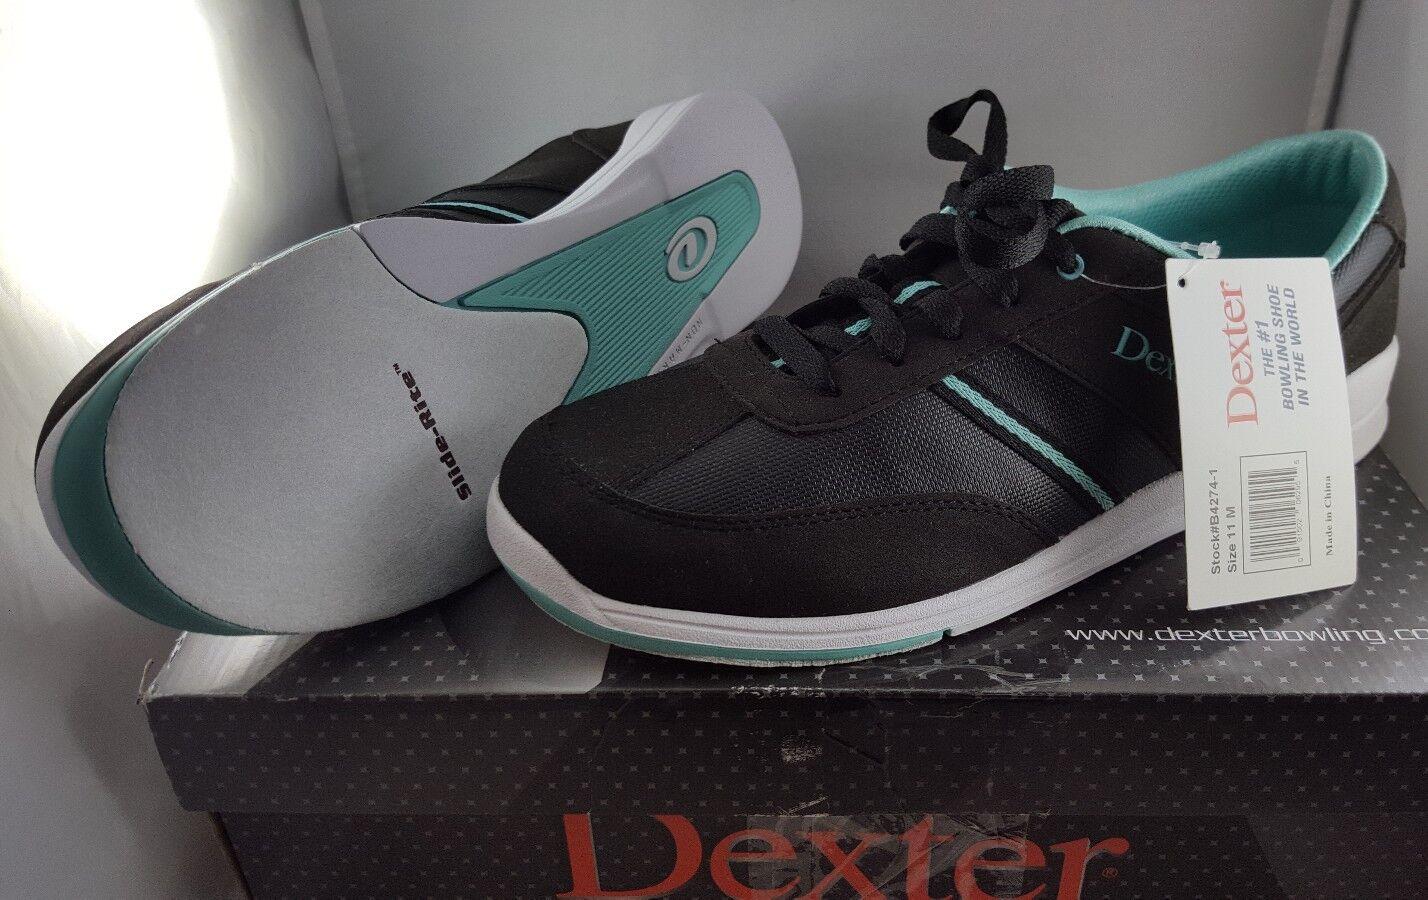 NEW Dexter WOMENS DANI Bowling shoes size 11 M b4274-1 Sport Pro CUTE SHOES